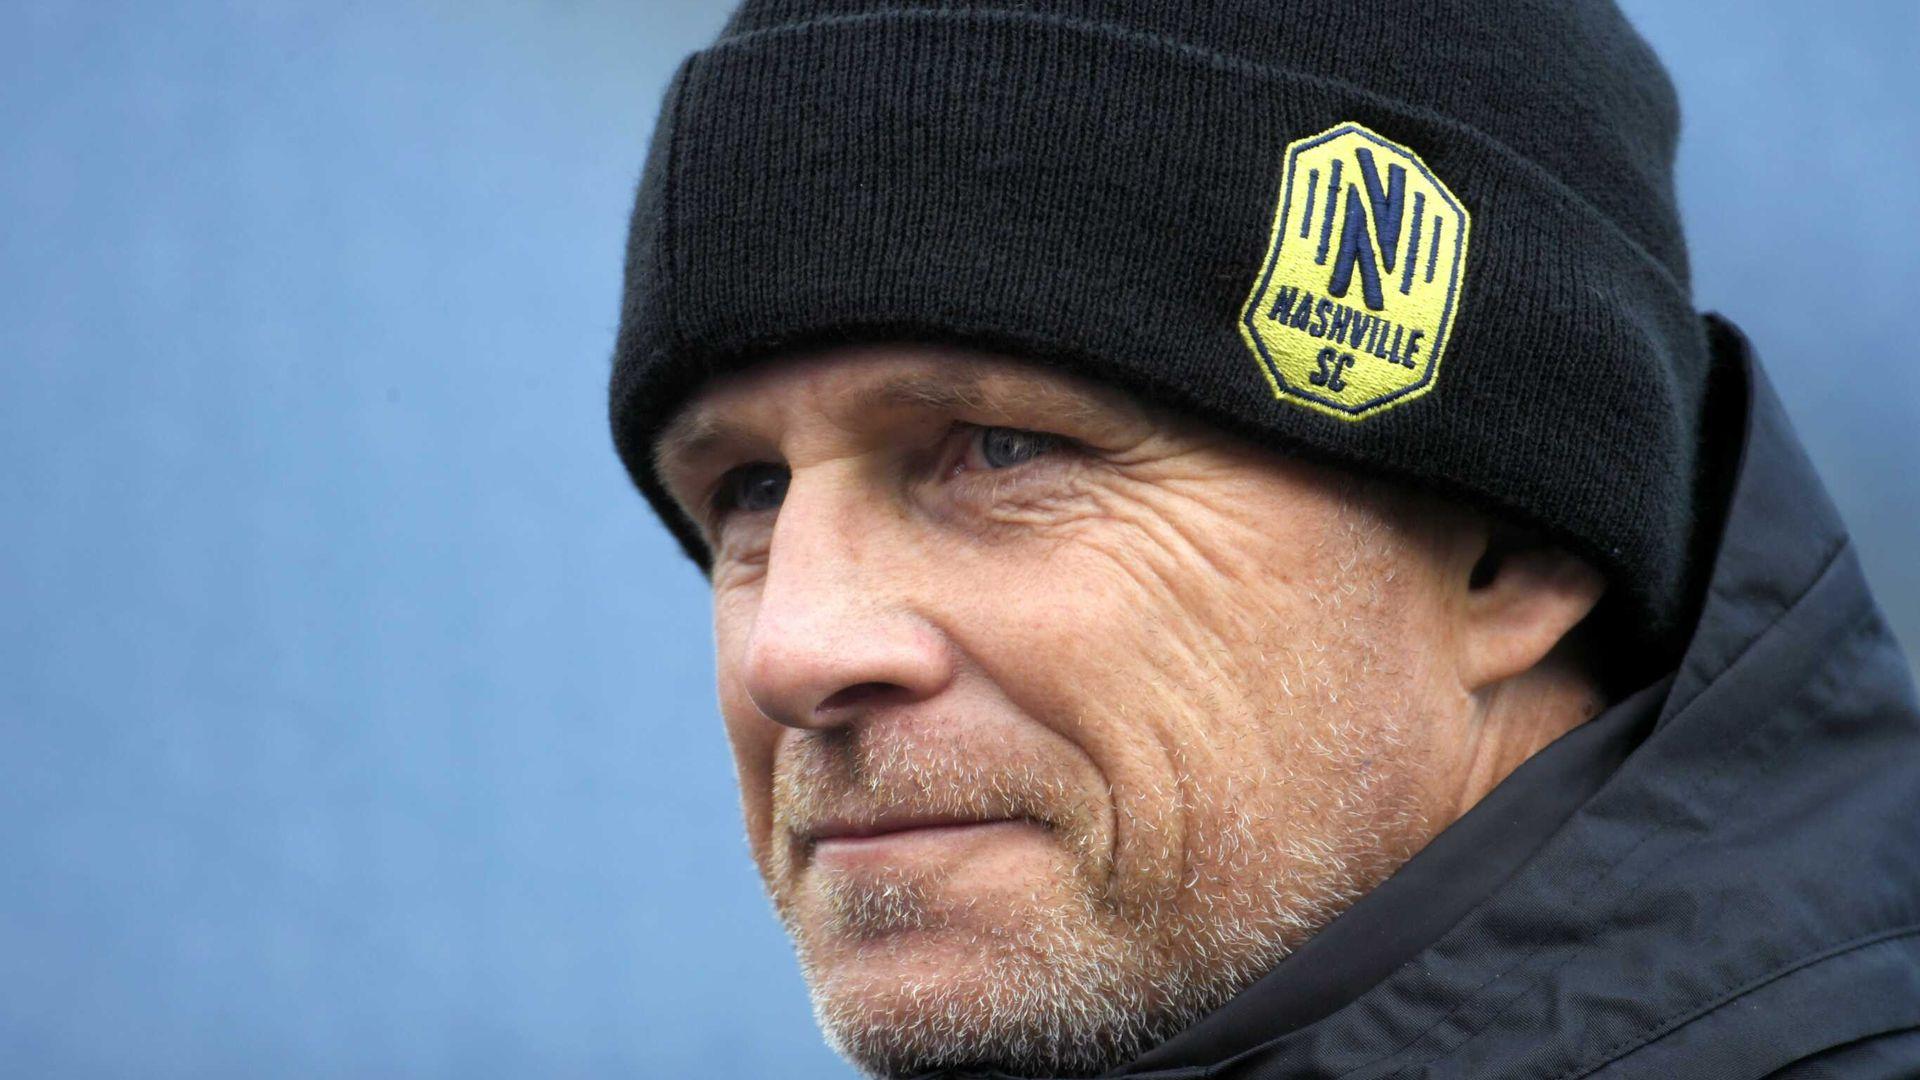 English coach out to stop Beckham's Miami